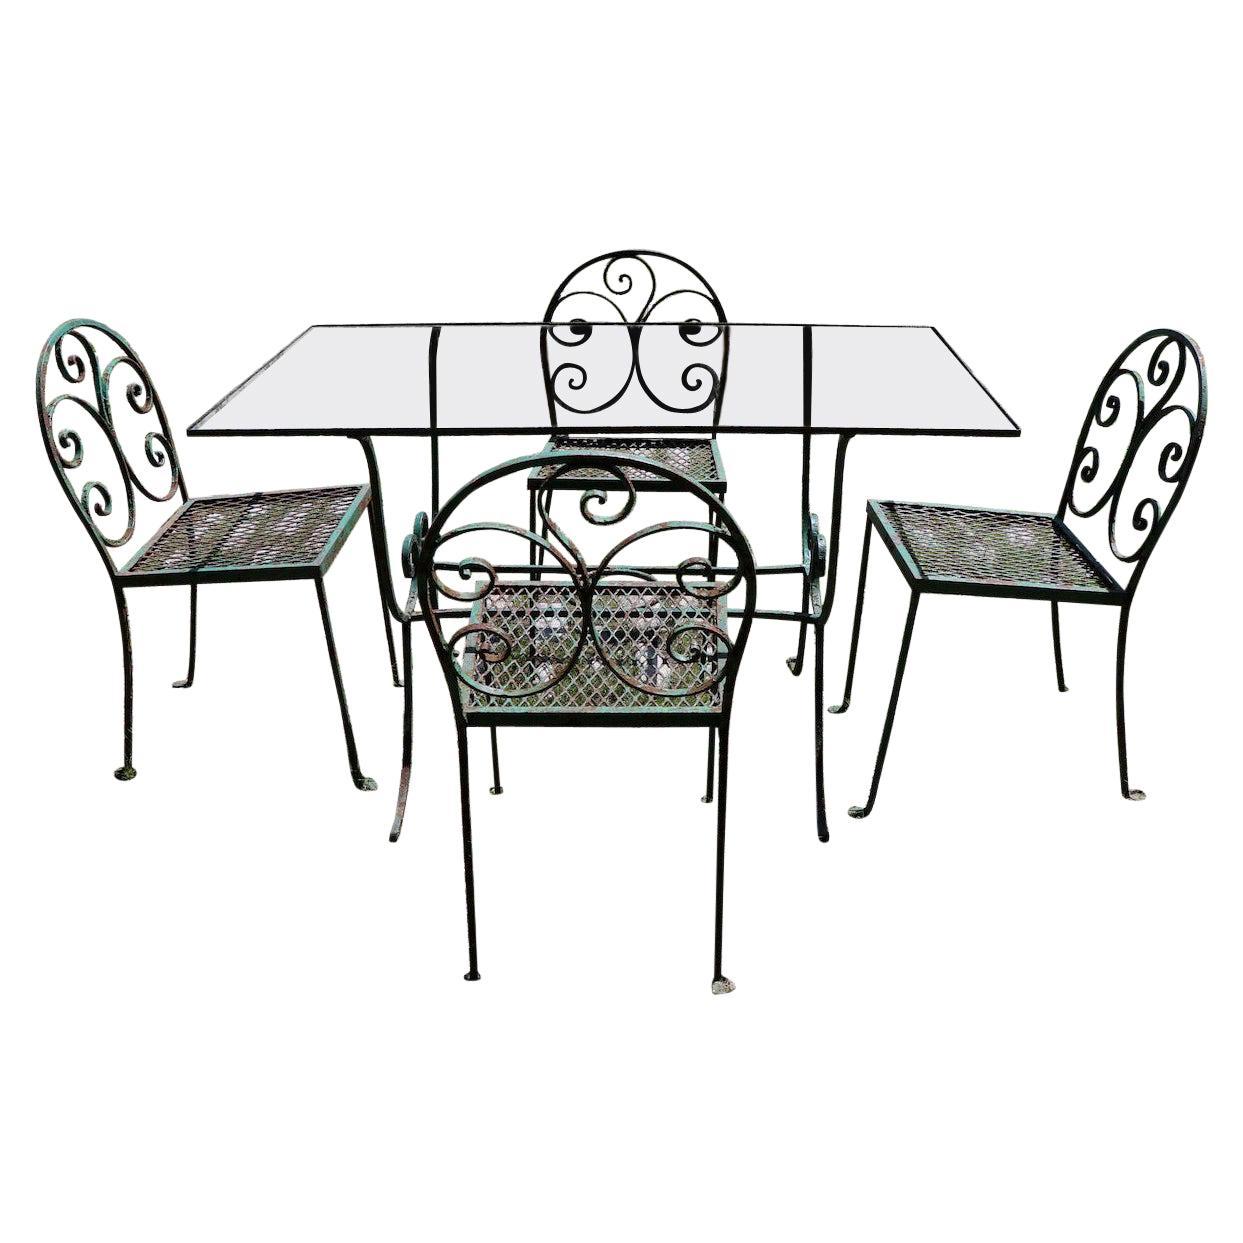 Art Deco Garden Patio Dining Set in the Style of Salterini